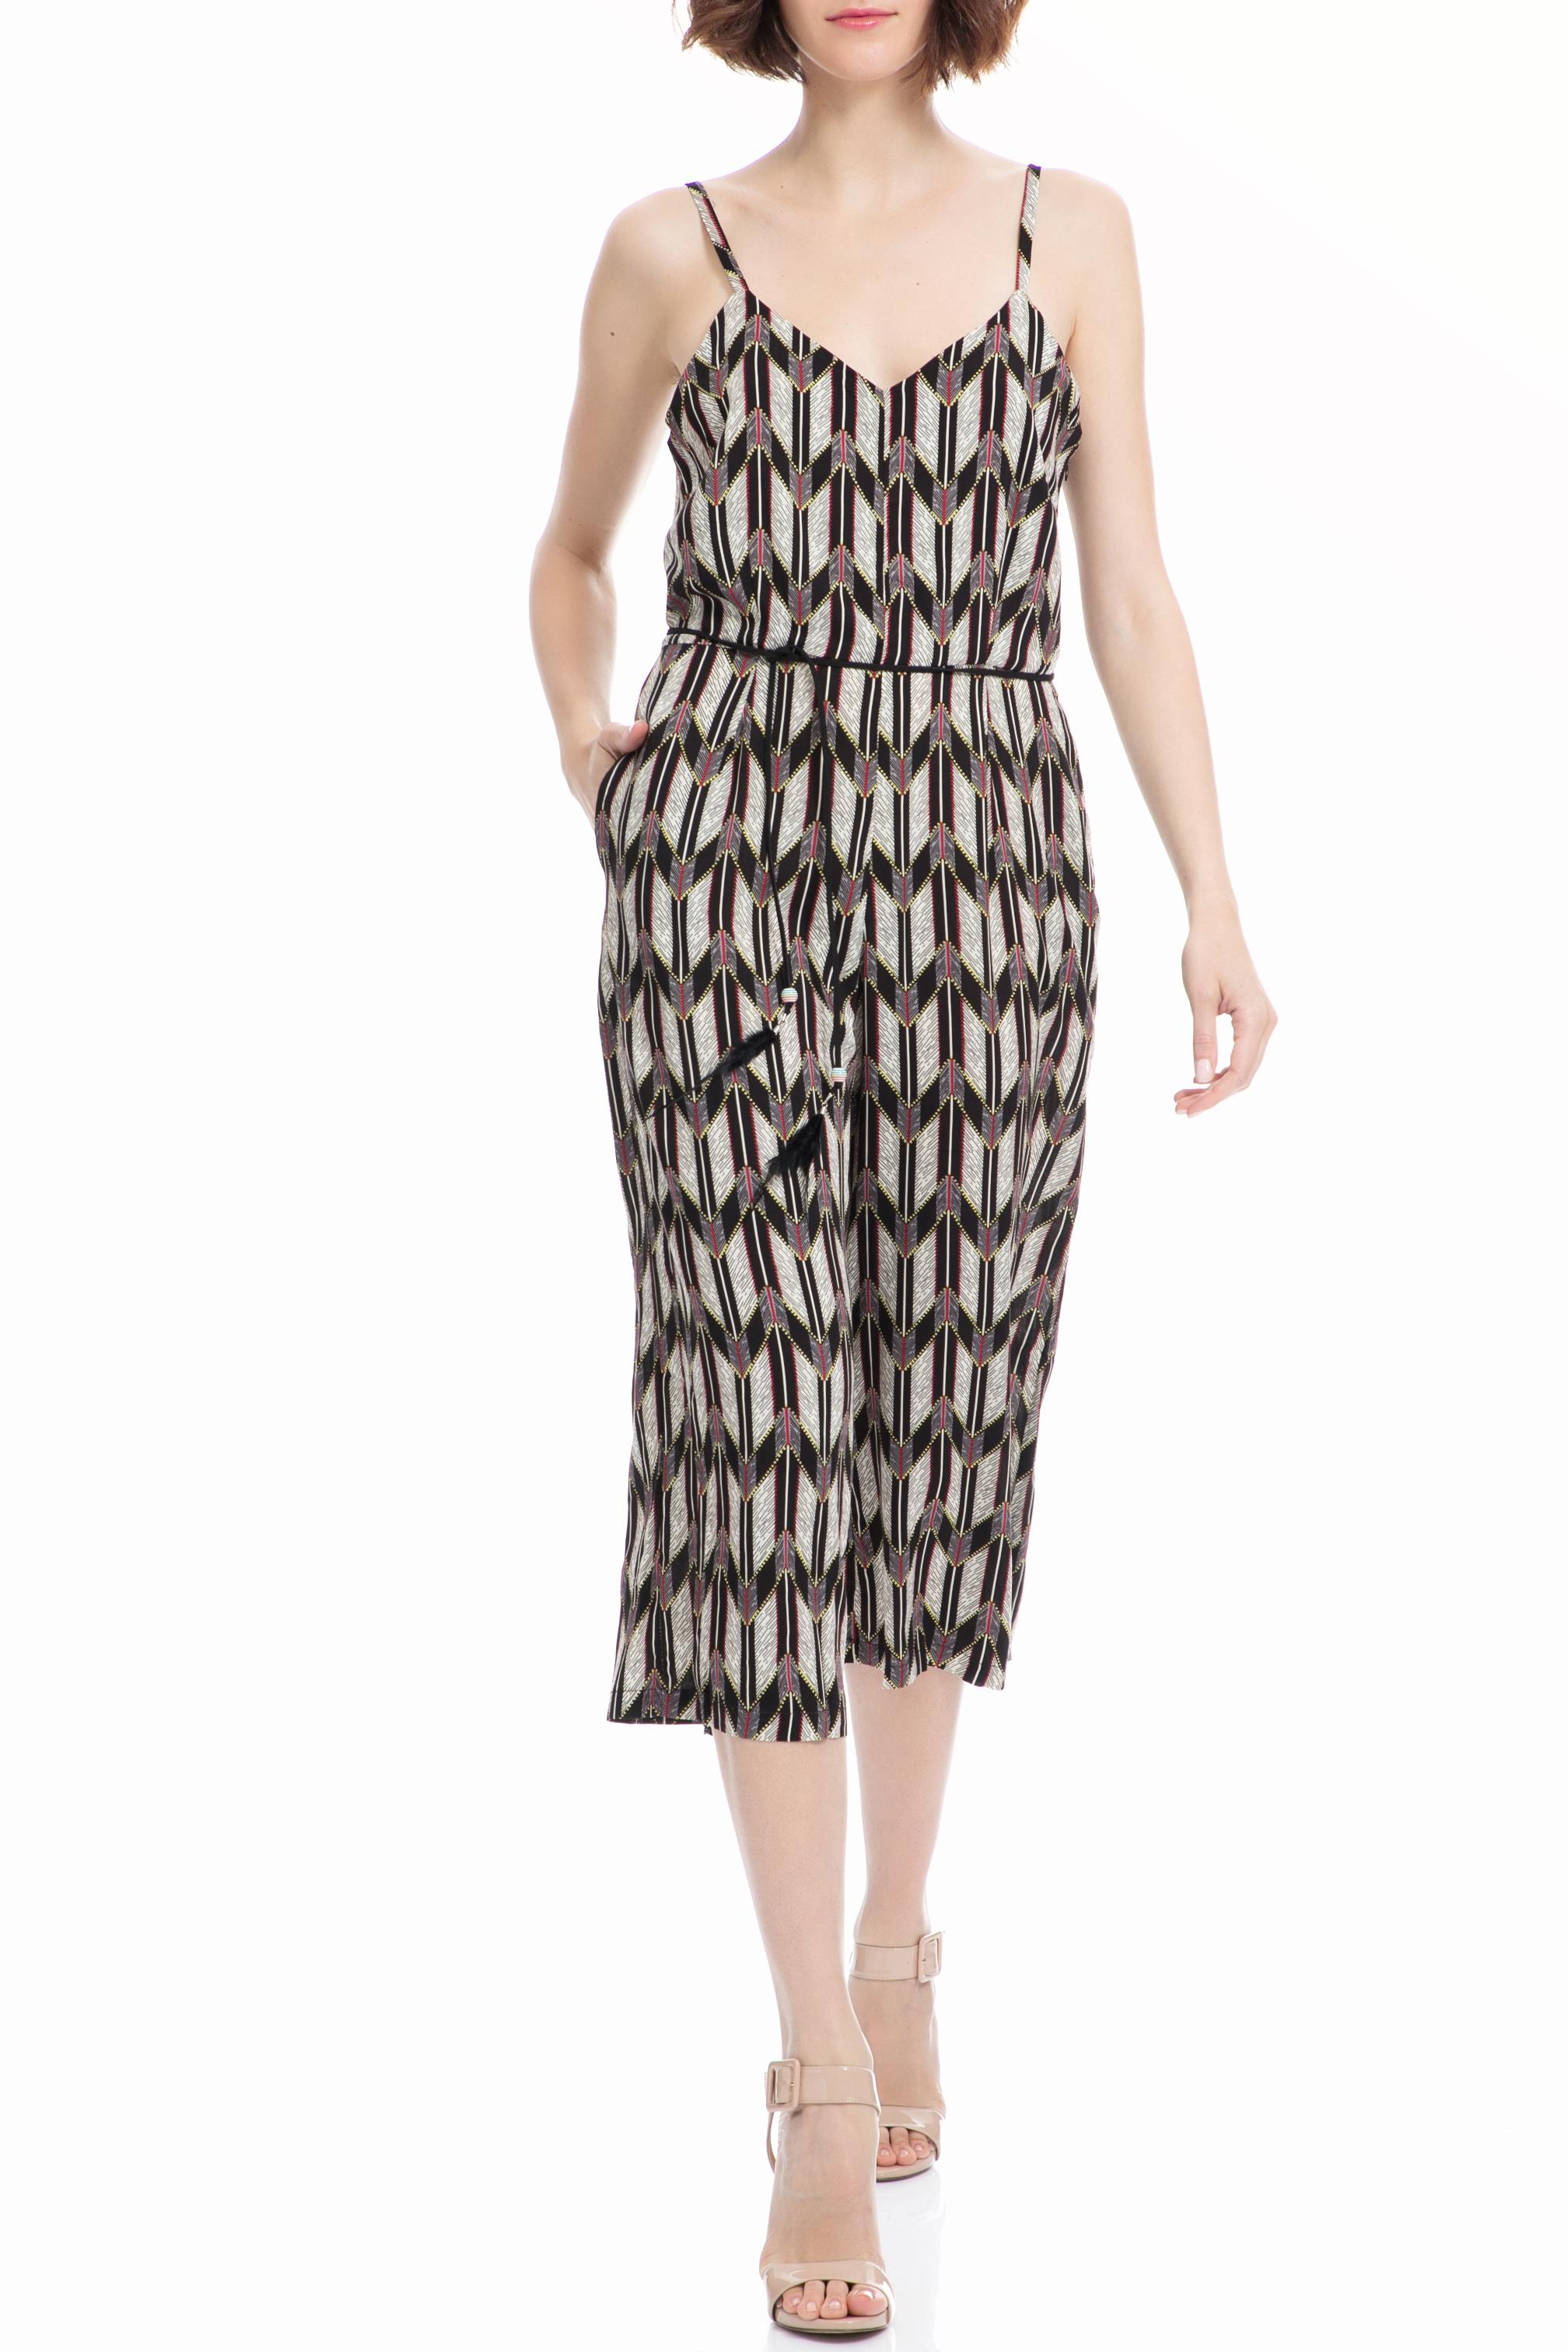 MOLLY BRACKEN – Ολόσωμη φόρμα MOLLY BRACKEN μαύρη-εκρού